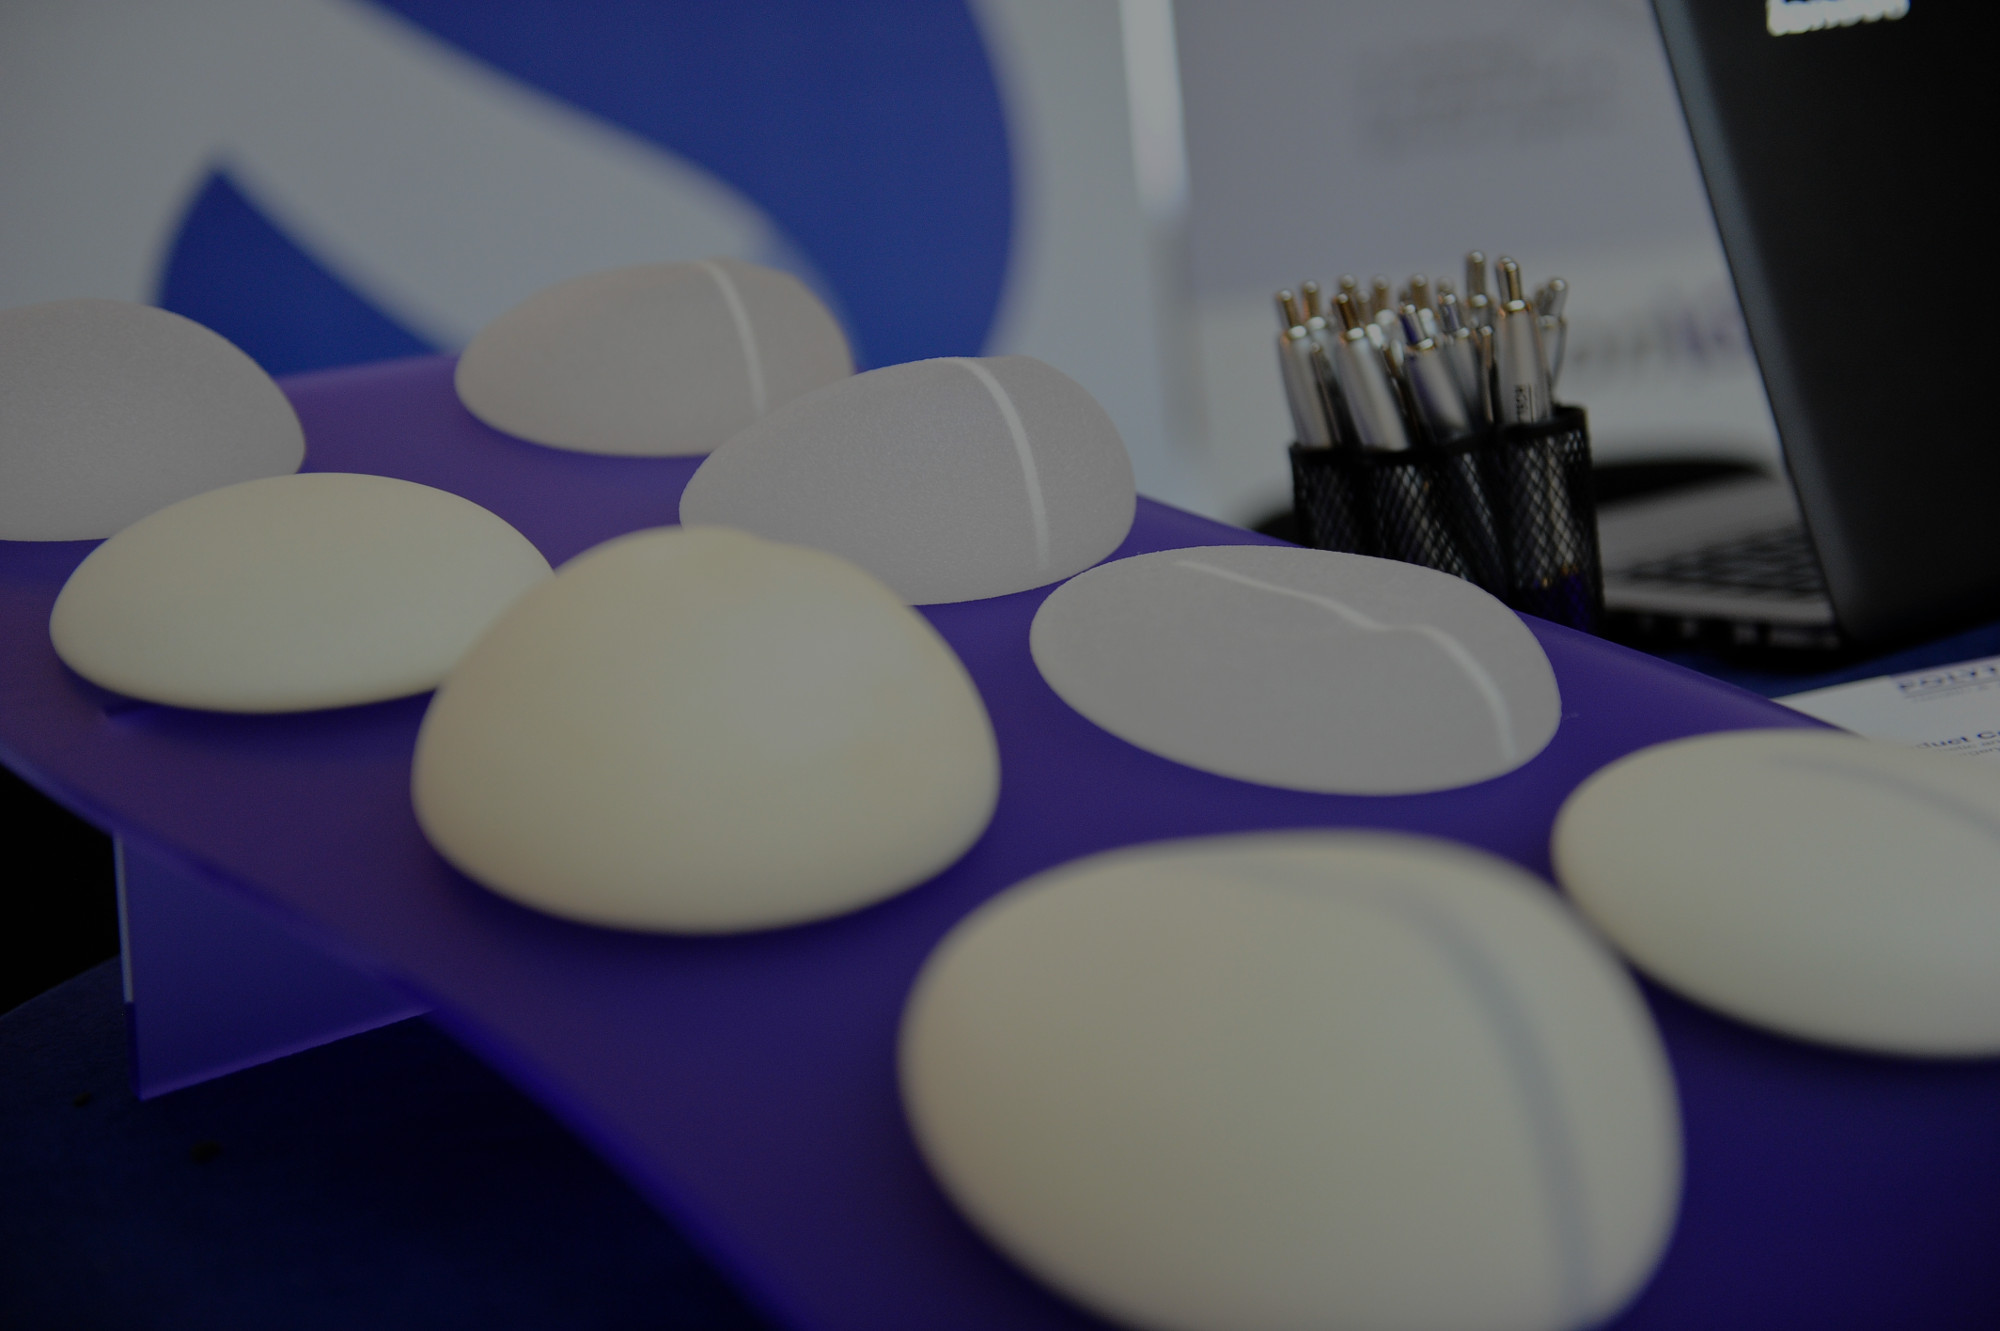 Implantes de busto en aparador